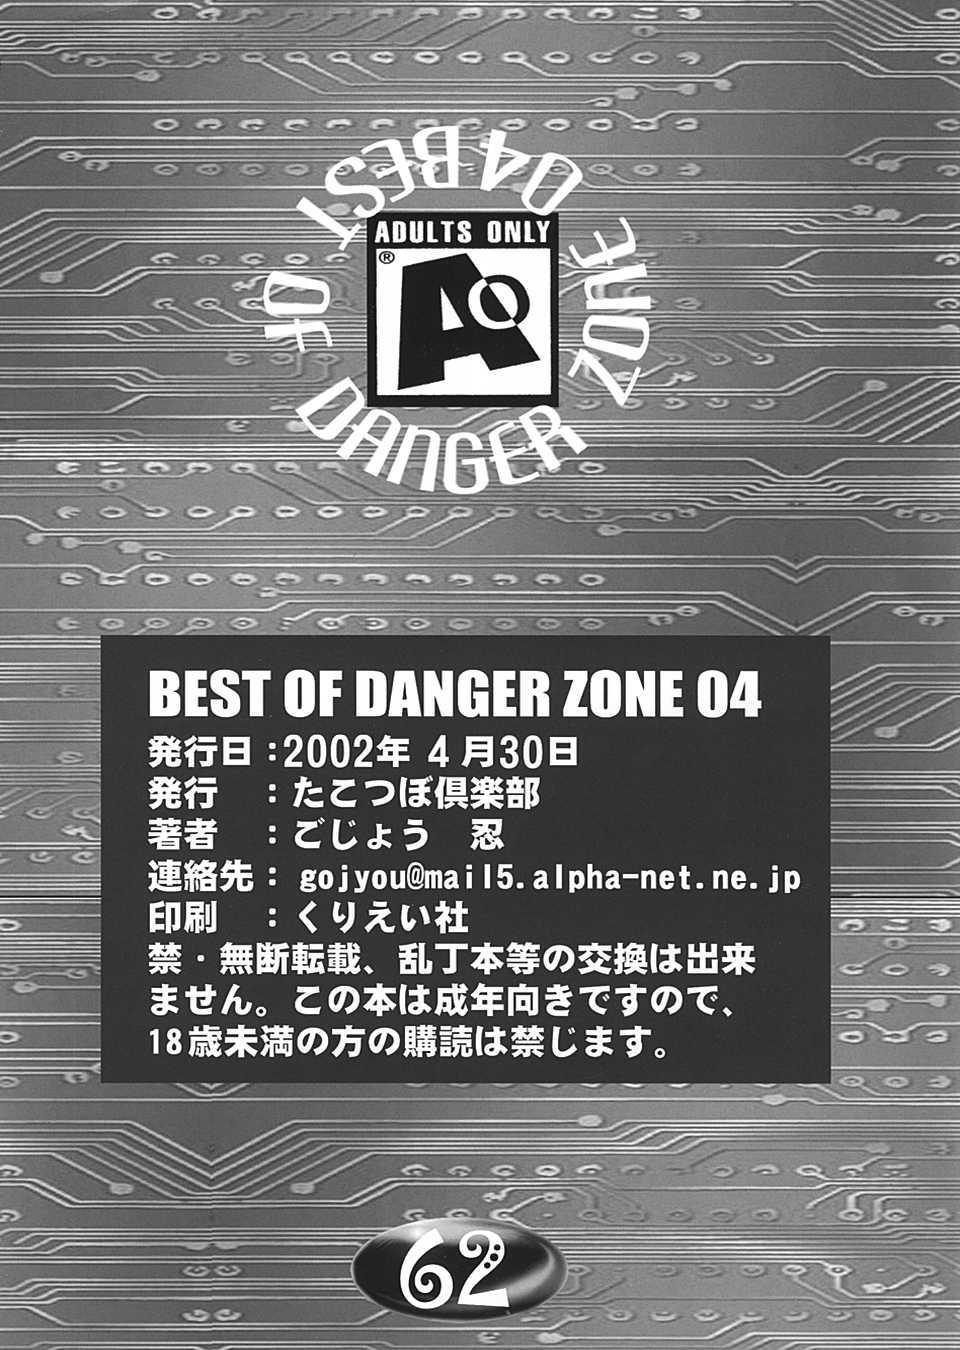 BEST OF DANGER ZONE 04 58